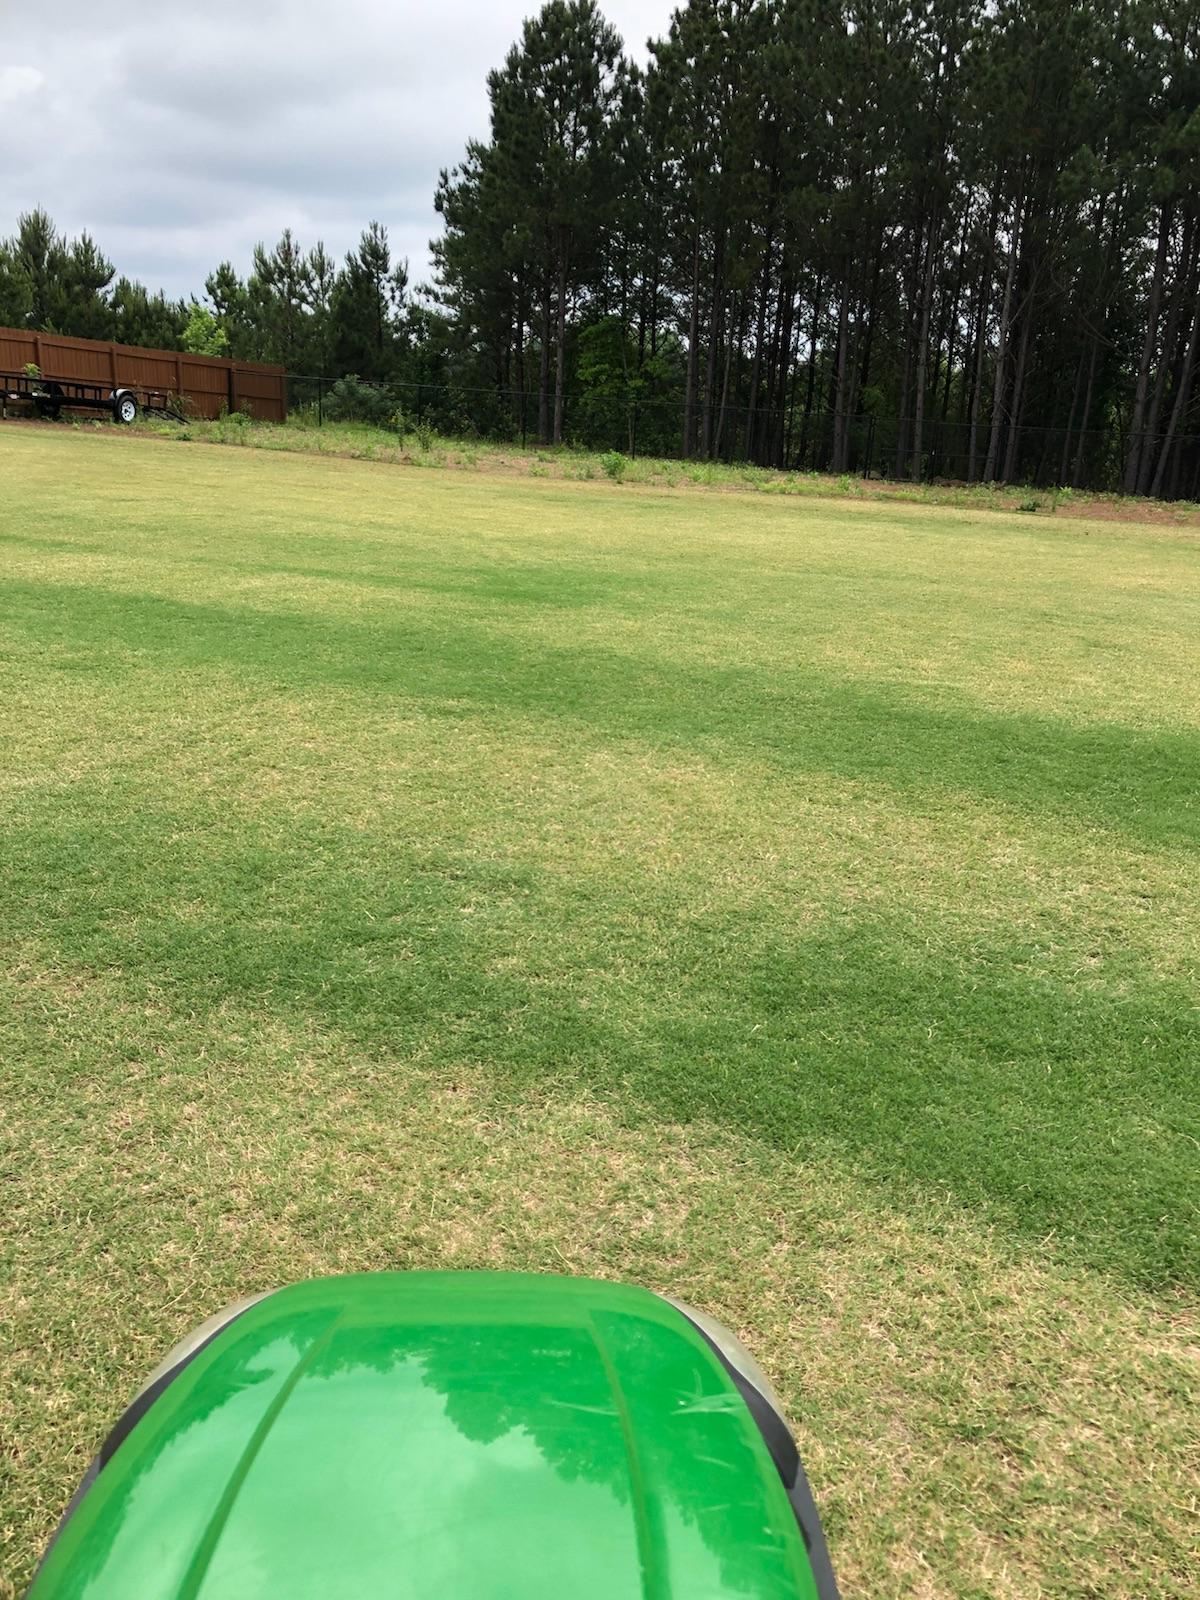 Daniel's TT lawn during Automower